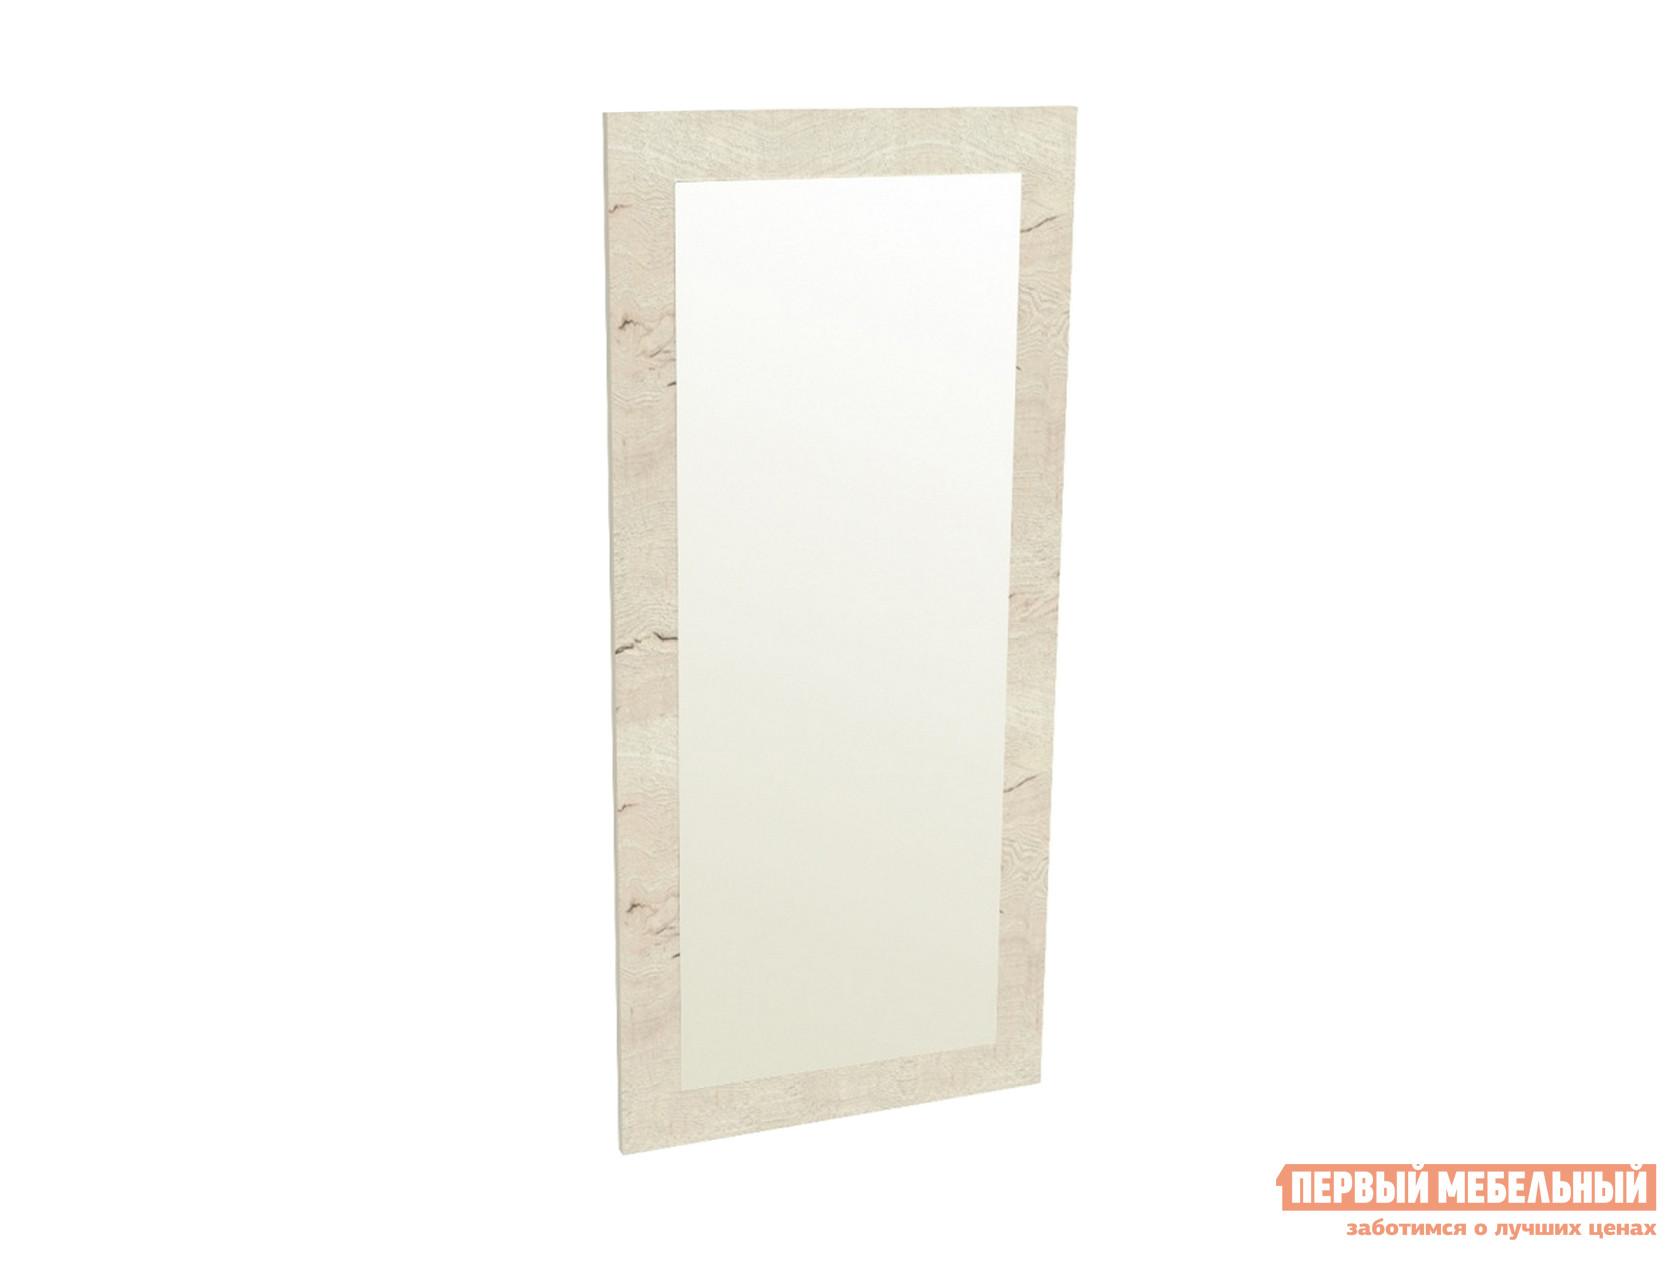 Настенное зеркало  ПМ-9 Зеркало 450 Дуб галифакс белый — ПМ-9 Зеркало 450 Дуб галифакс белый